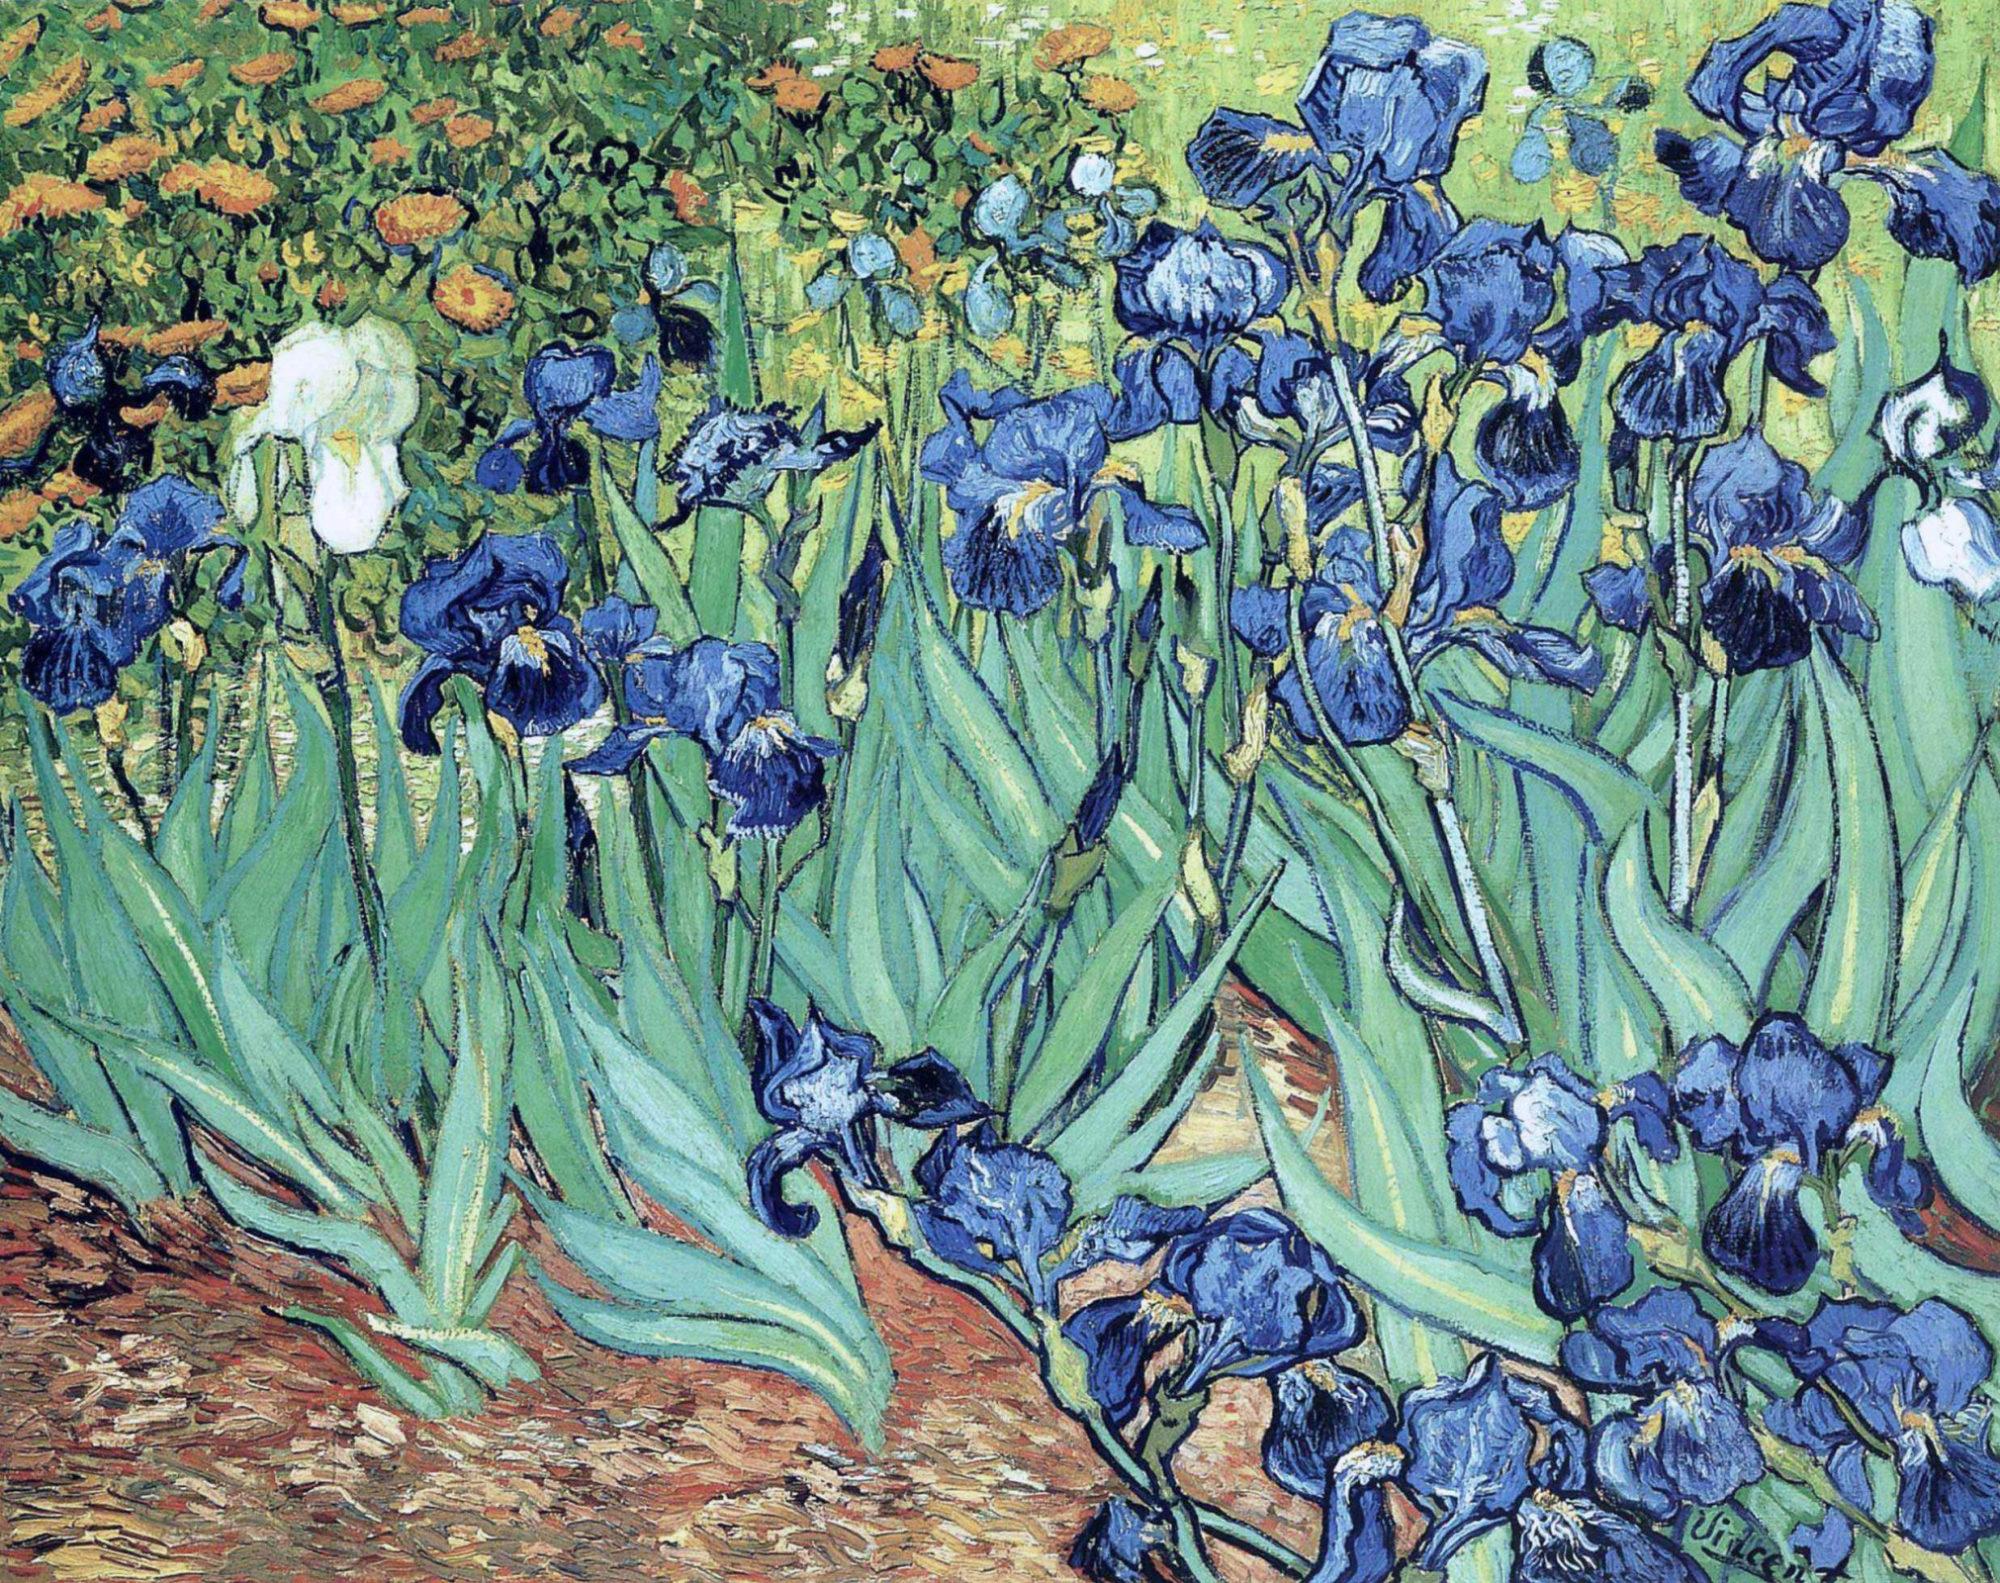 Винсент Ван Гог, 1889 год, картина «Ирисы».